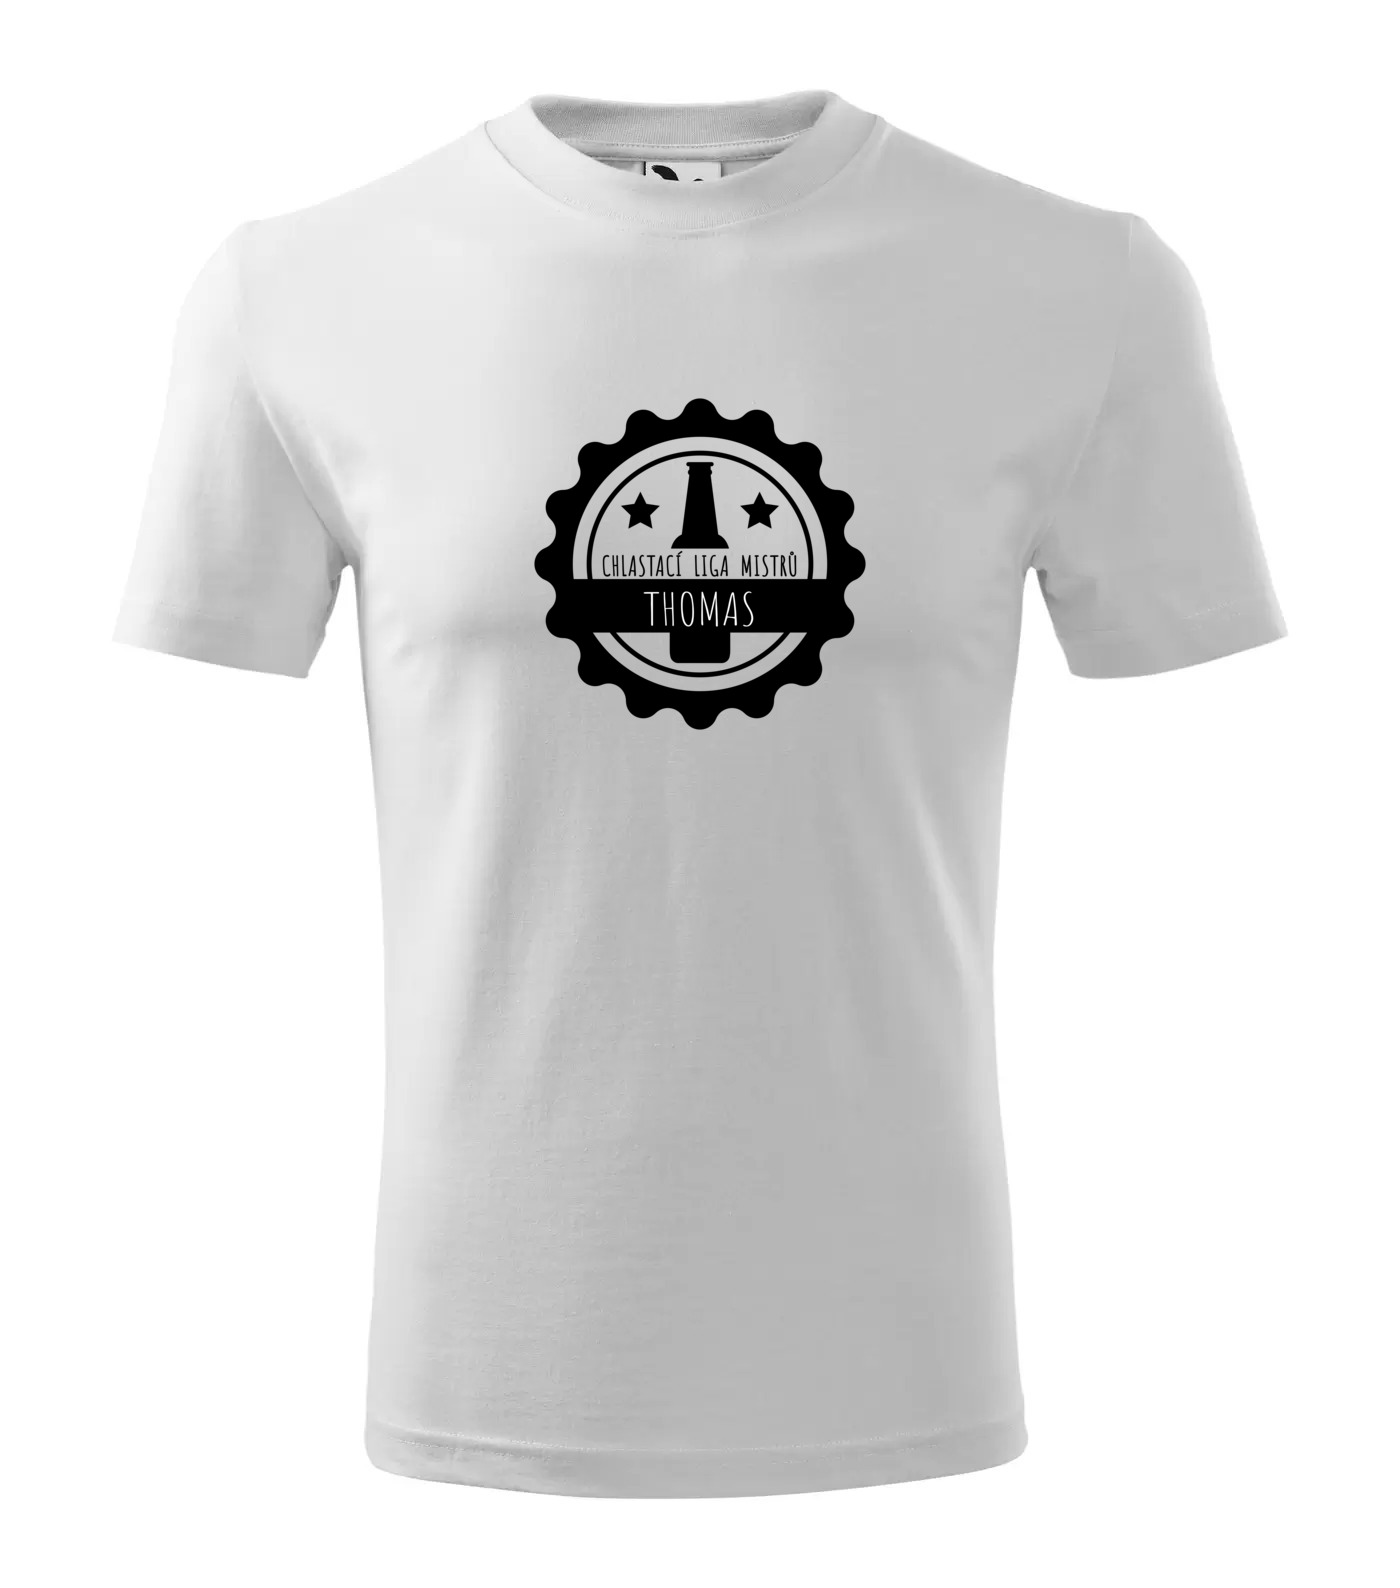 Tričko Chlastací liga mužů Thomas